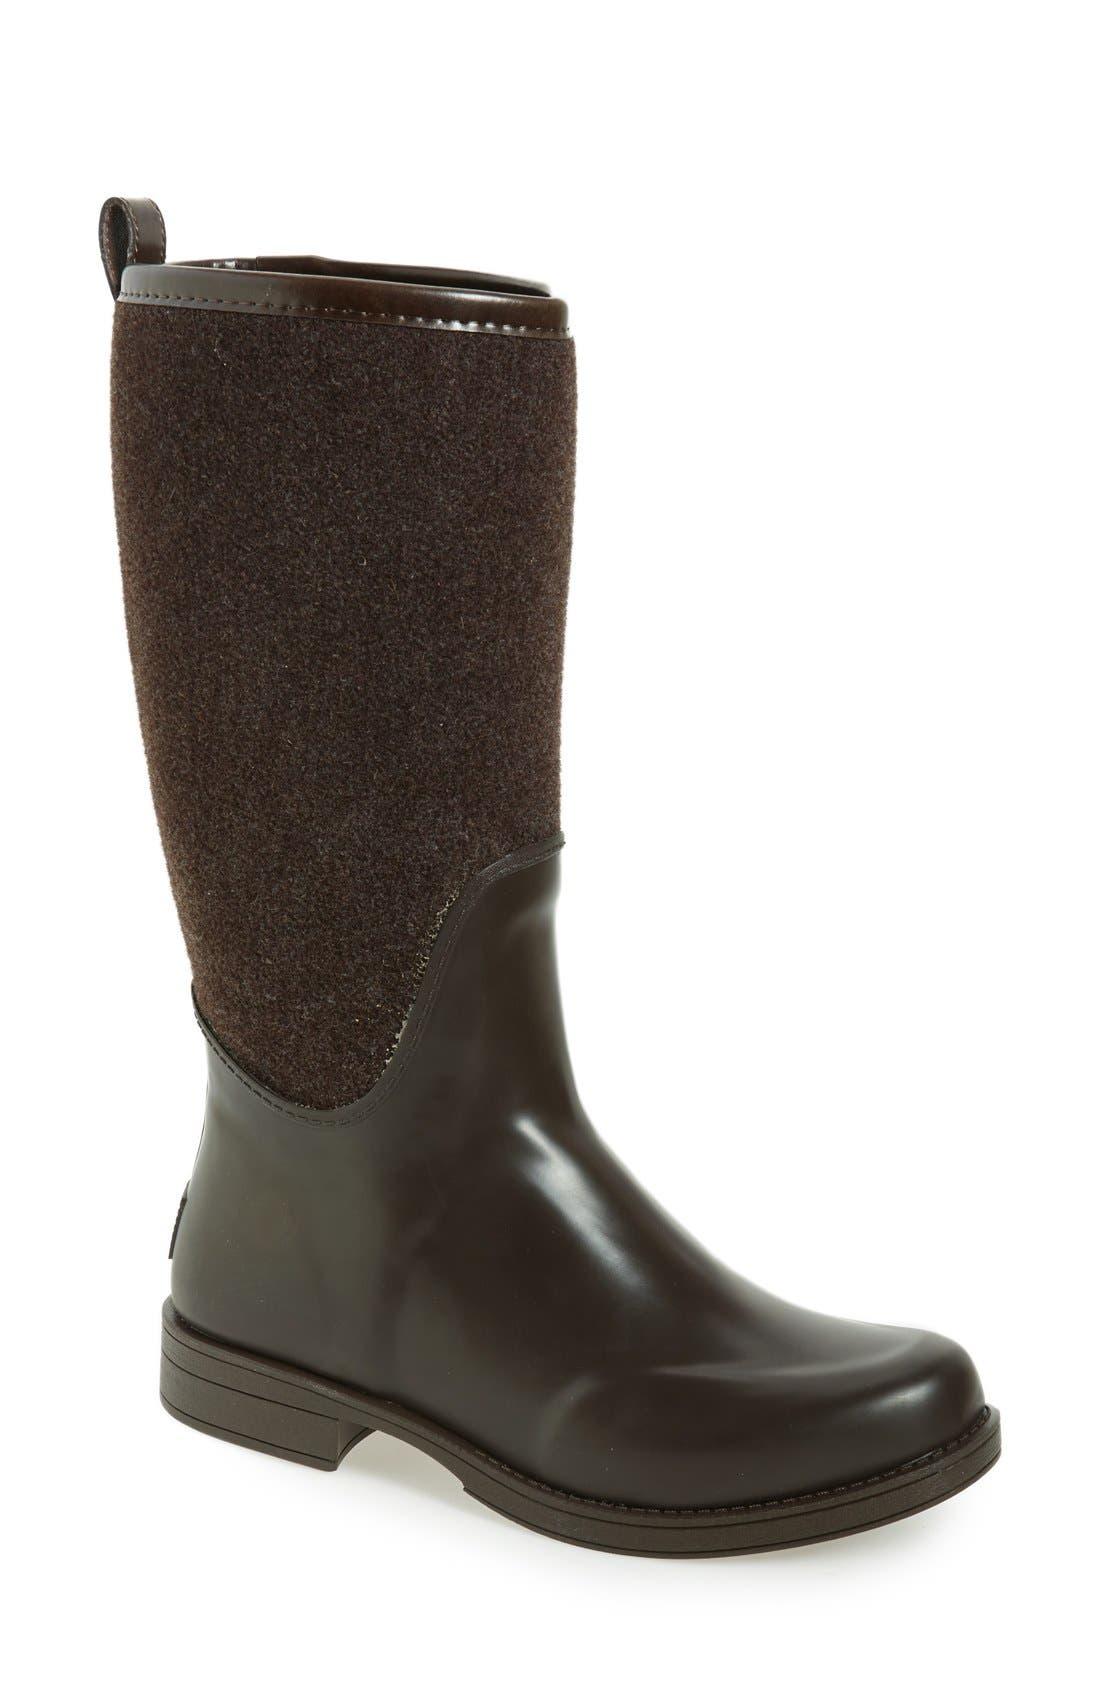 Main Image - UGG® Reignfall Waterproof Rain Boot (Women)